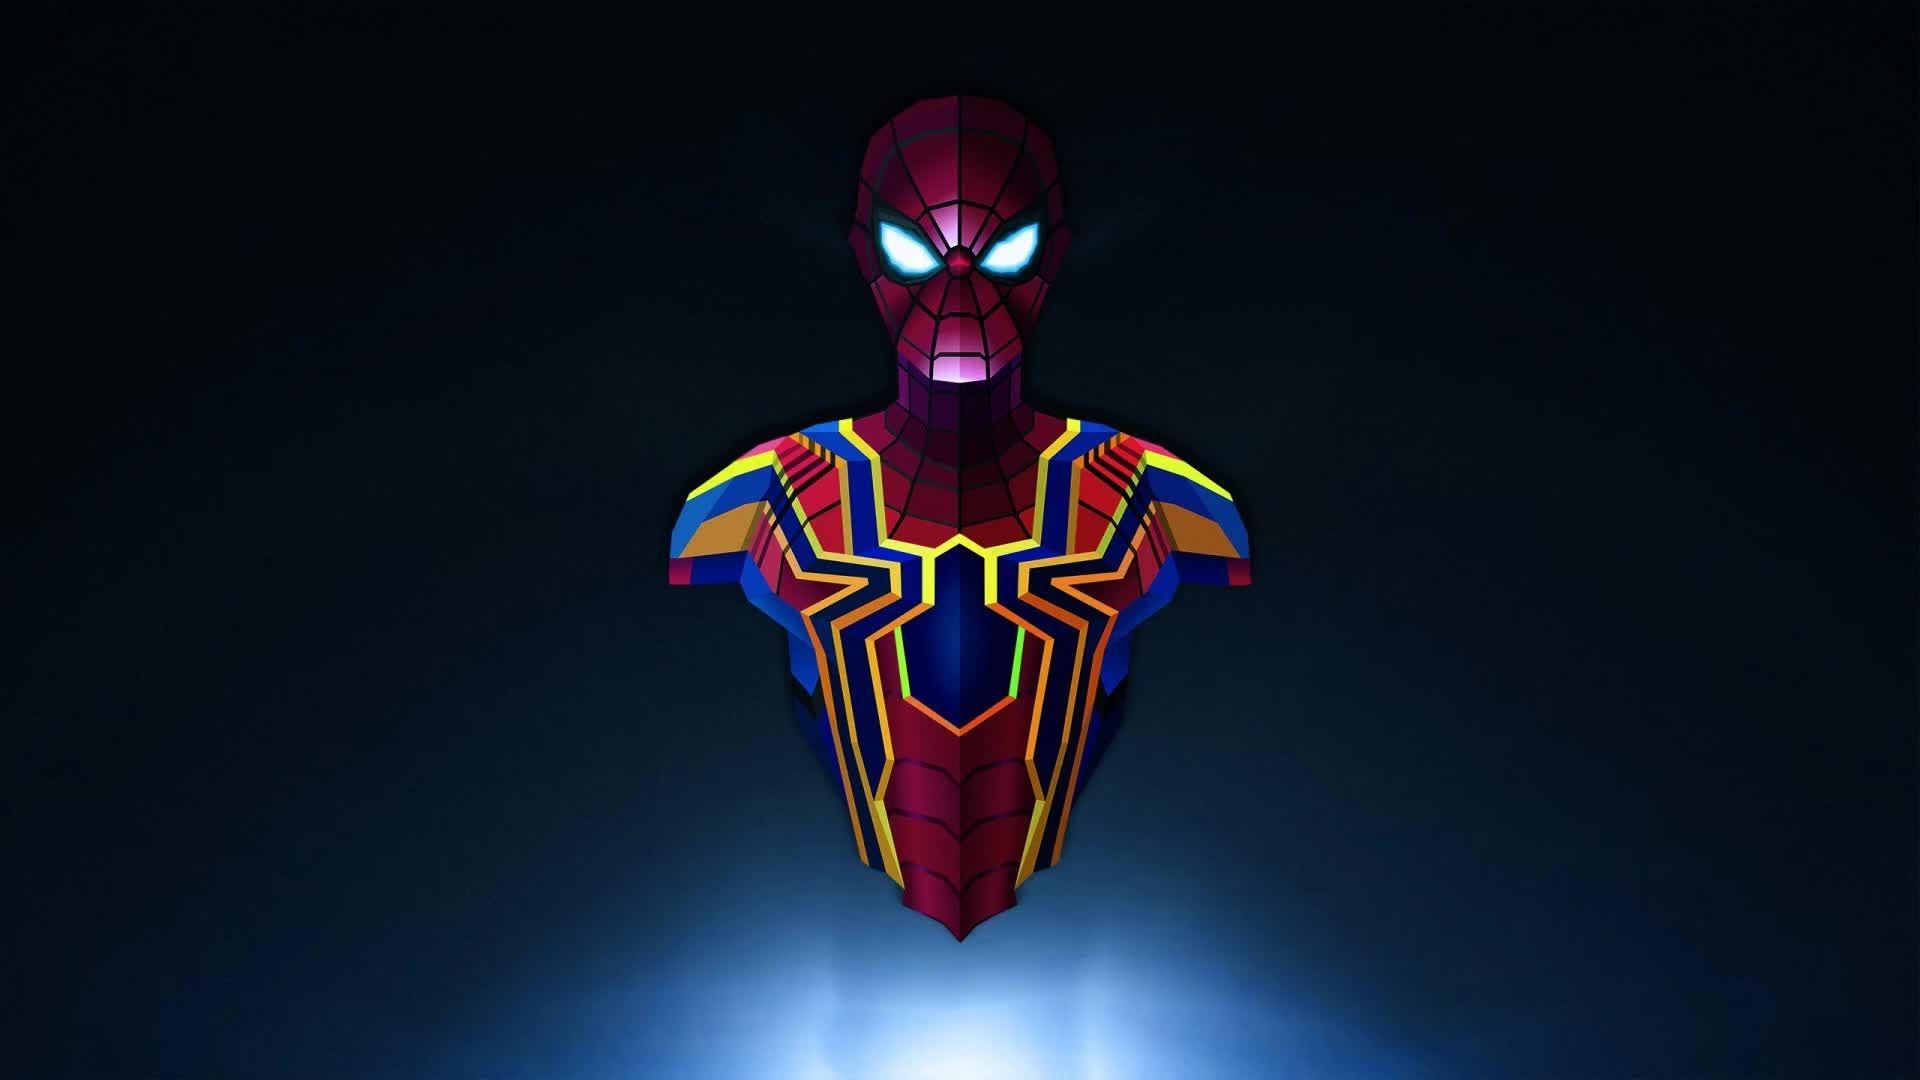 Spiderman Infinity War Wallpaper Hd - HD Wallpaper